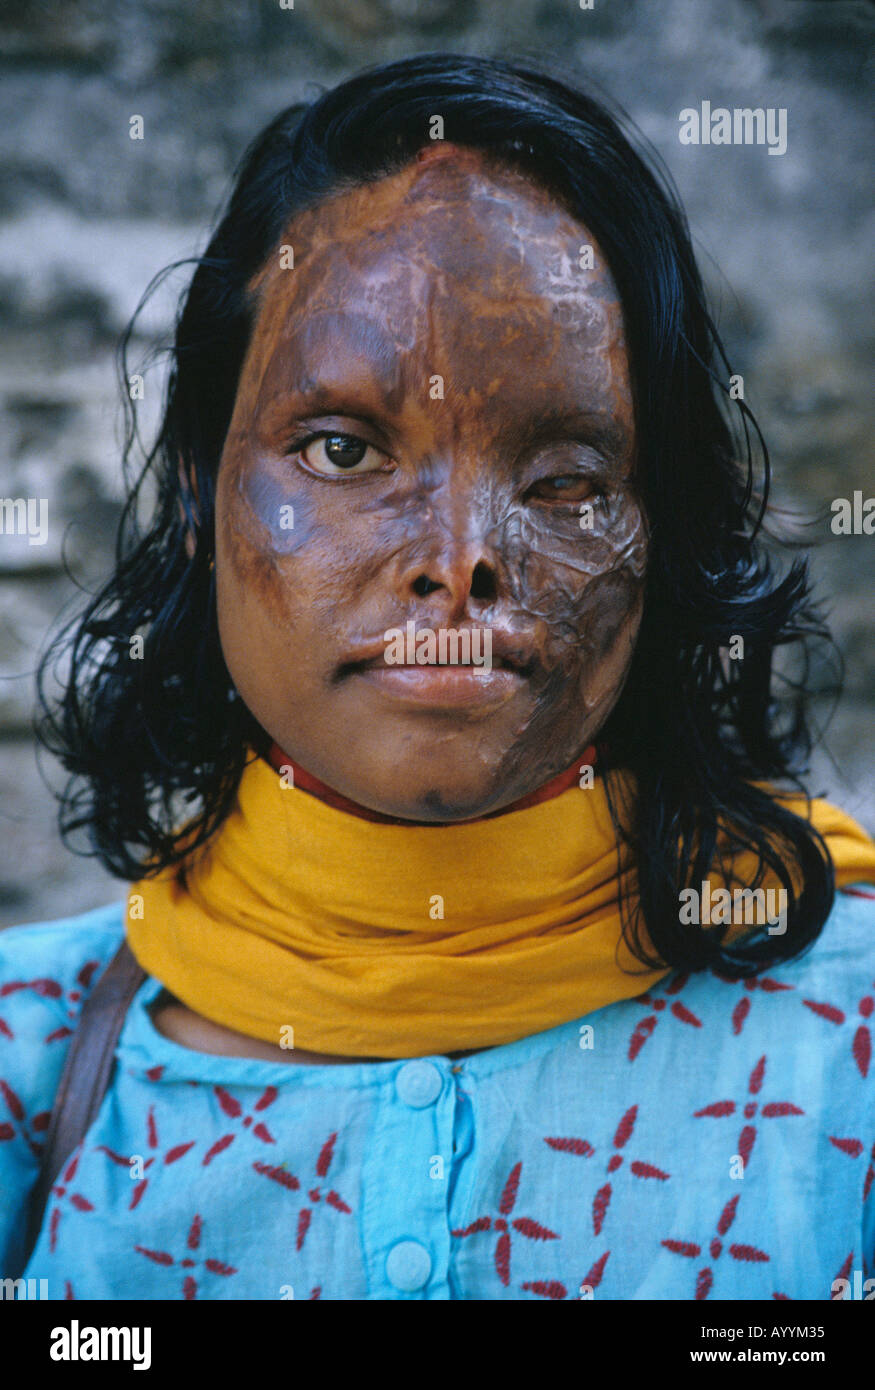 Bangladesh, acid attack survivor - Stock Image